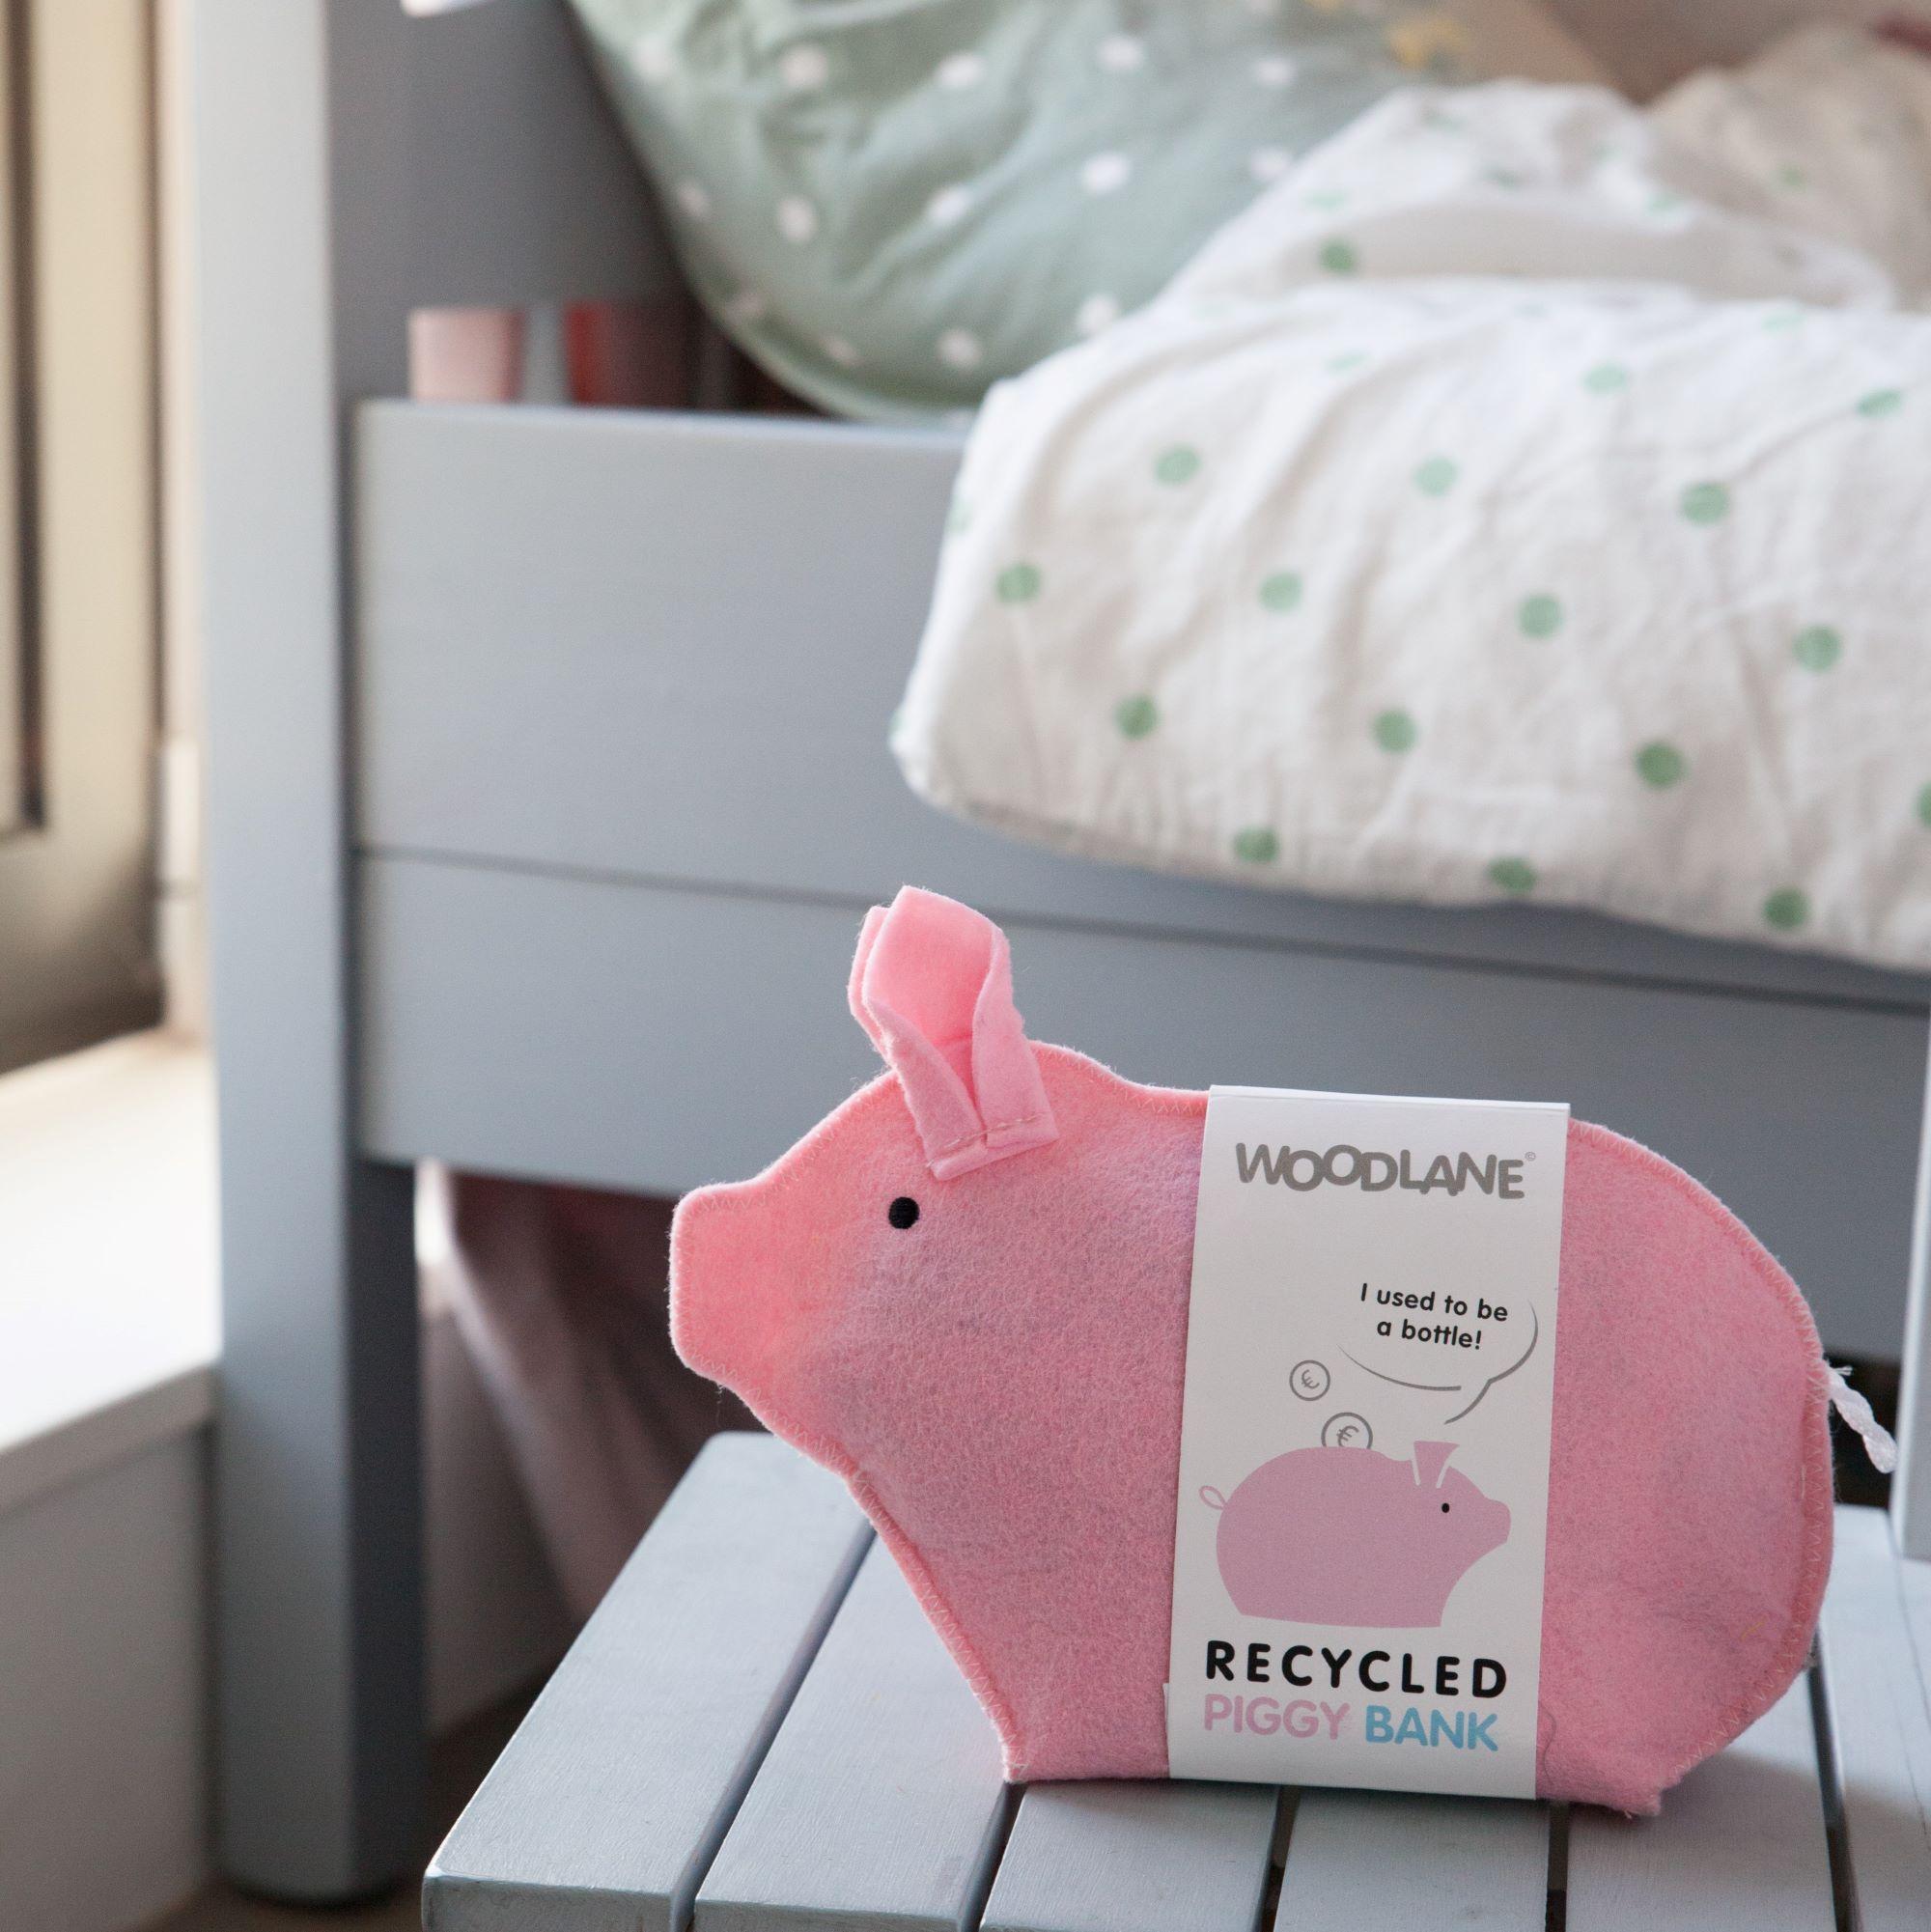 Woodlane Piggy-Frederique van Gemert-8739